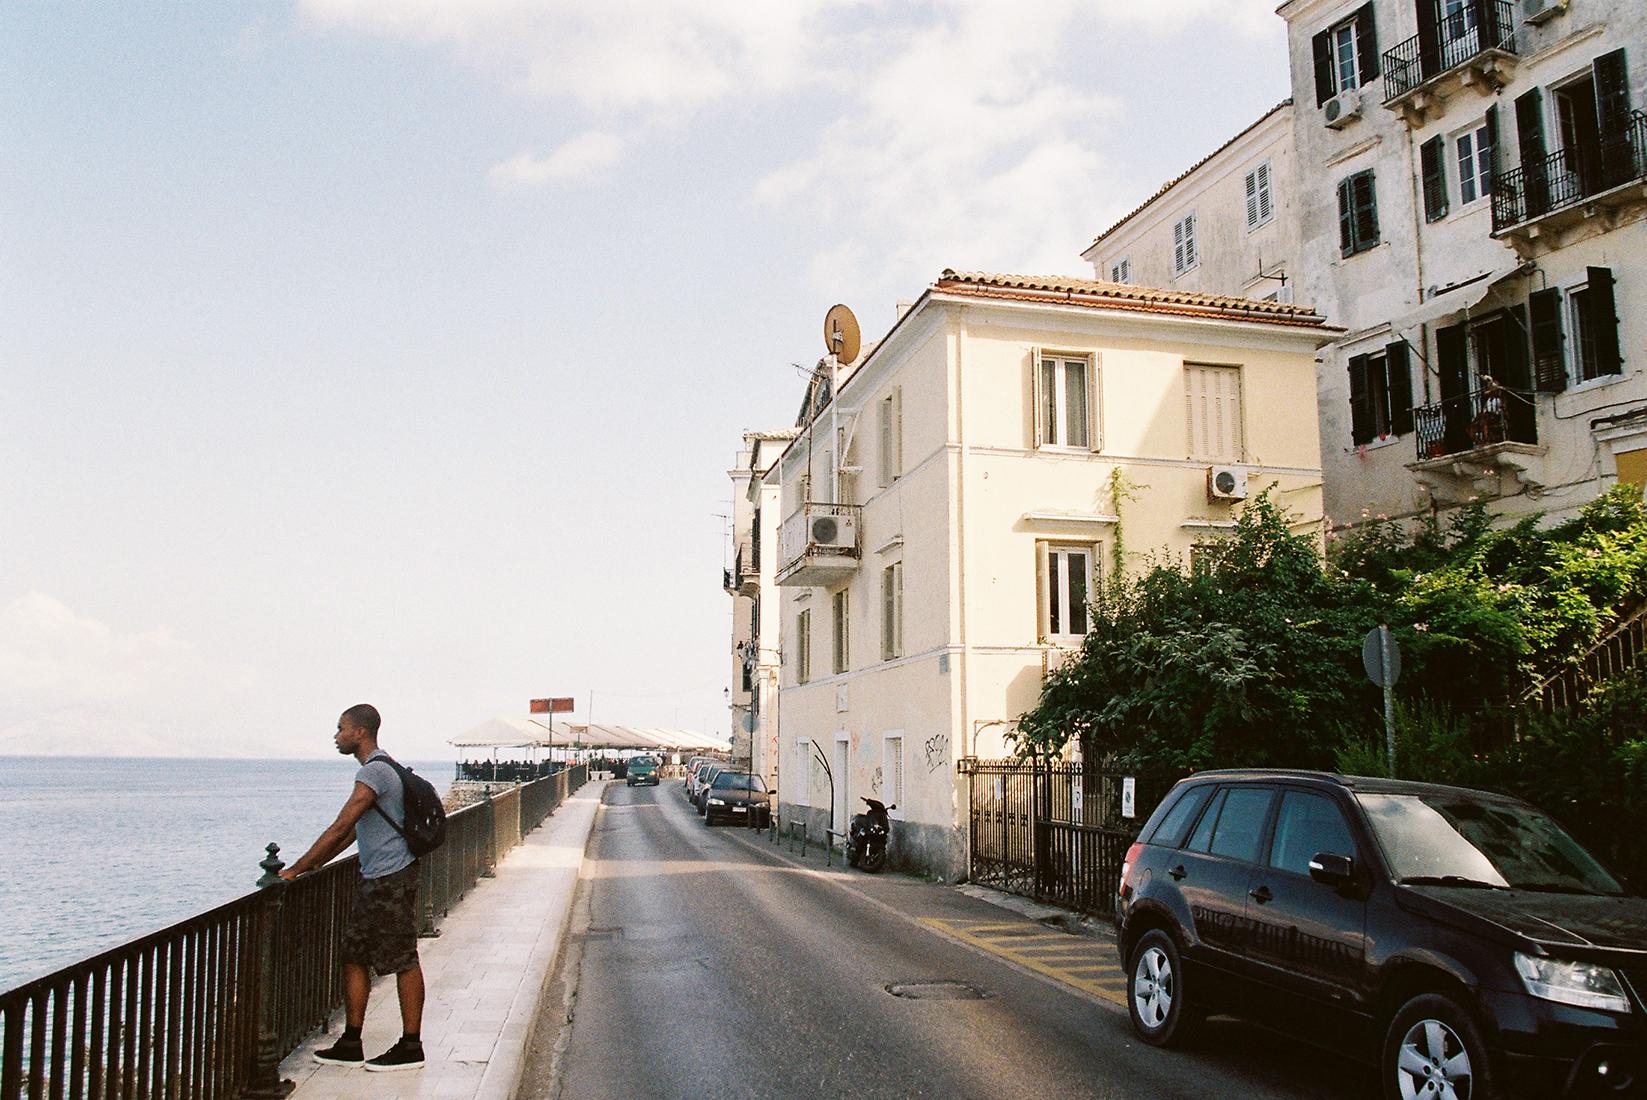 Corfu (Kerkyra) 35mm film travel diary by London photographer Ailera Stone